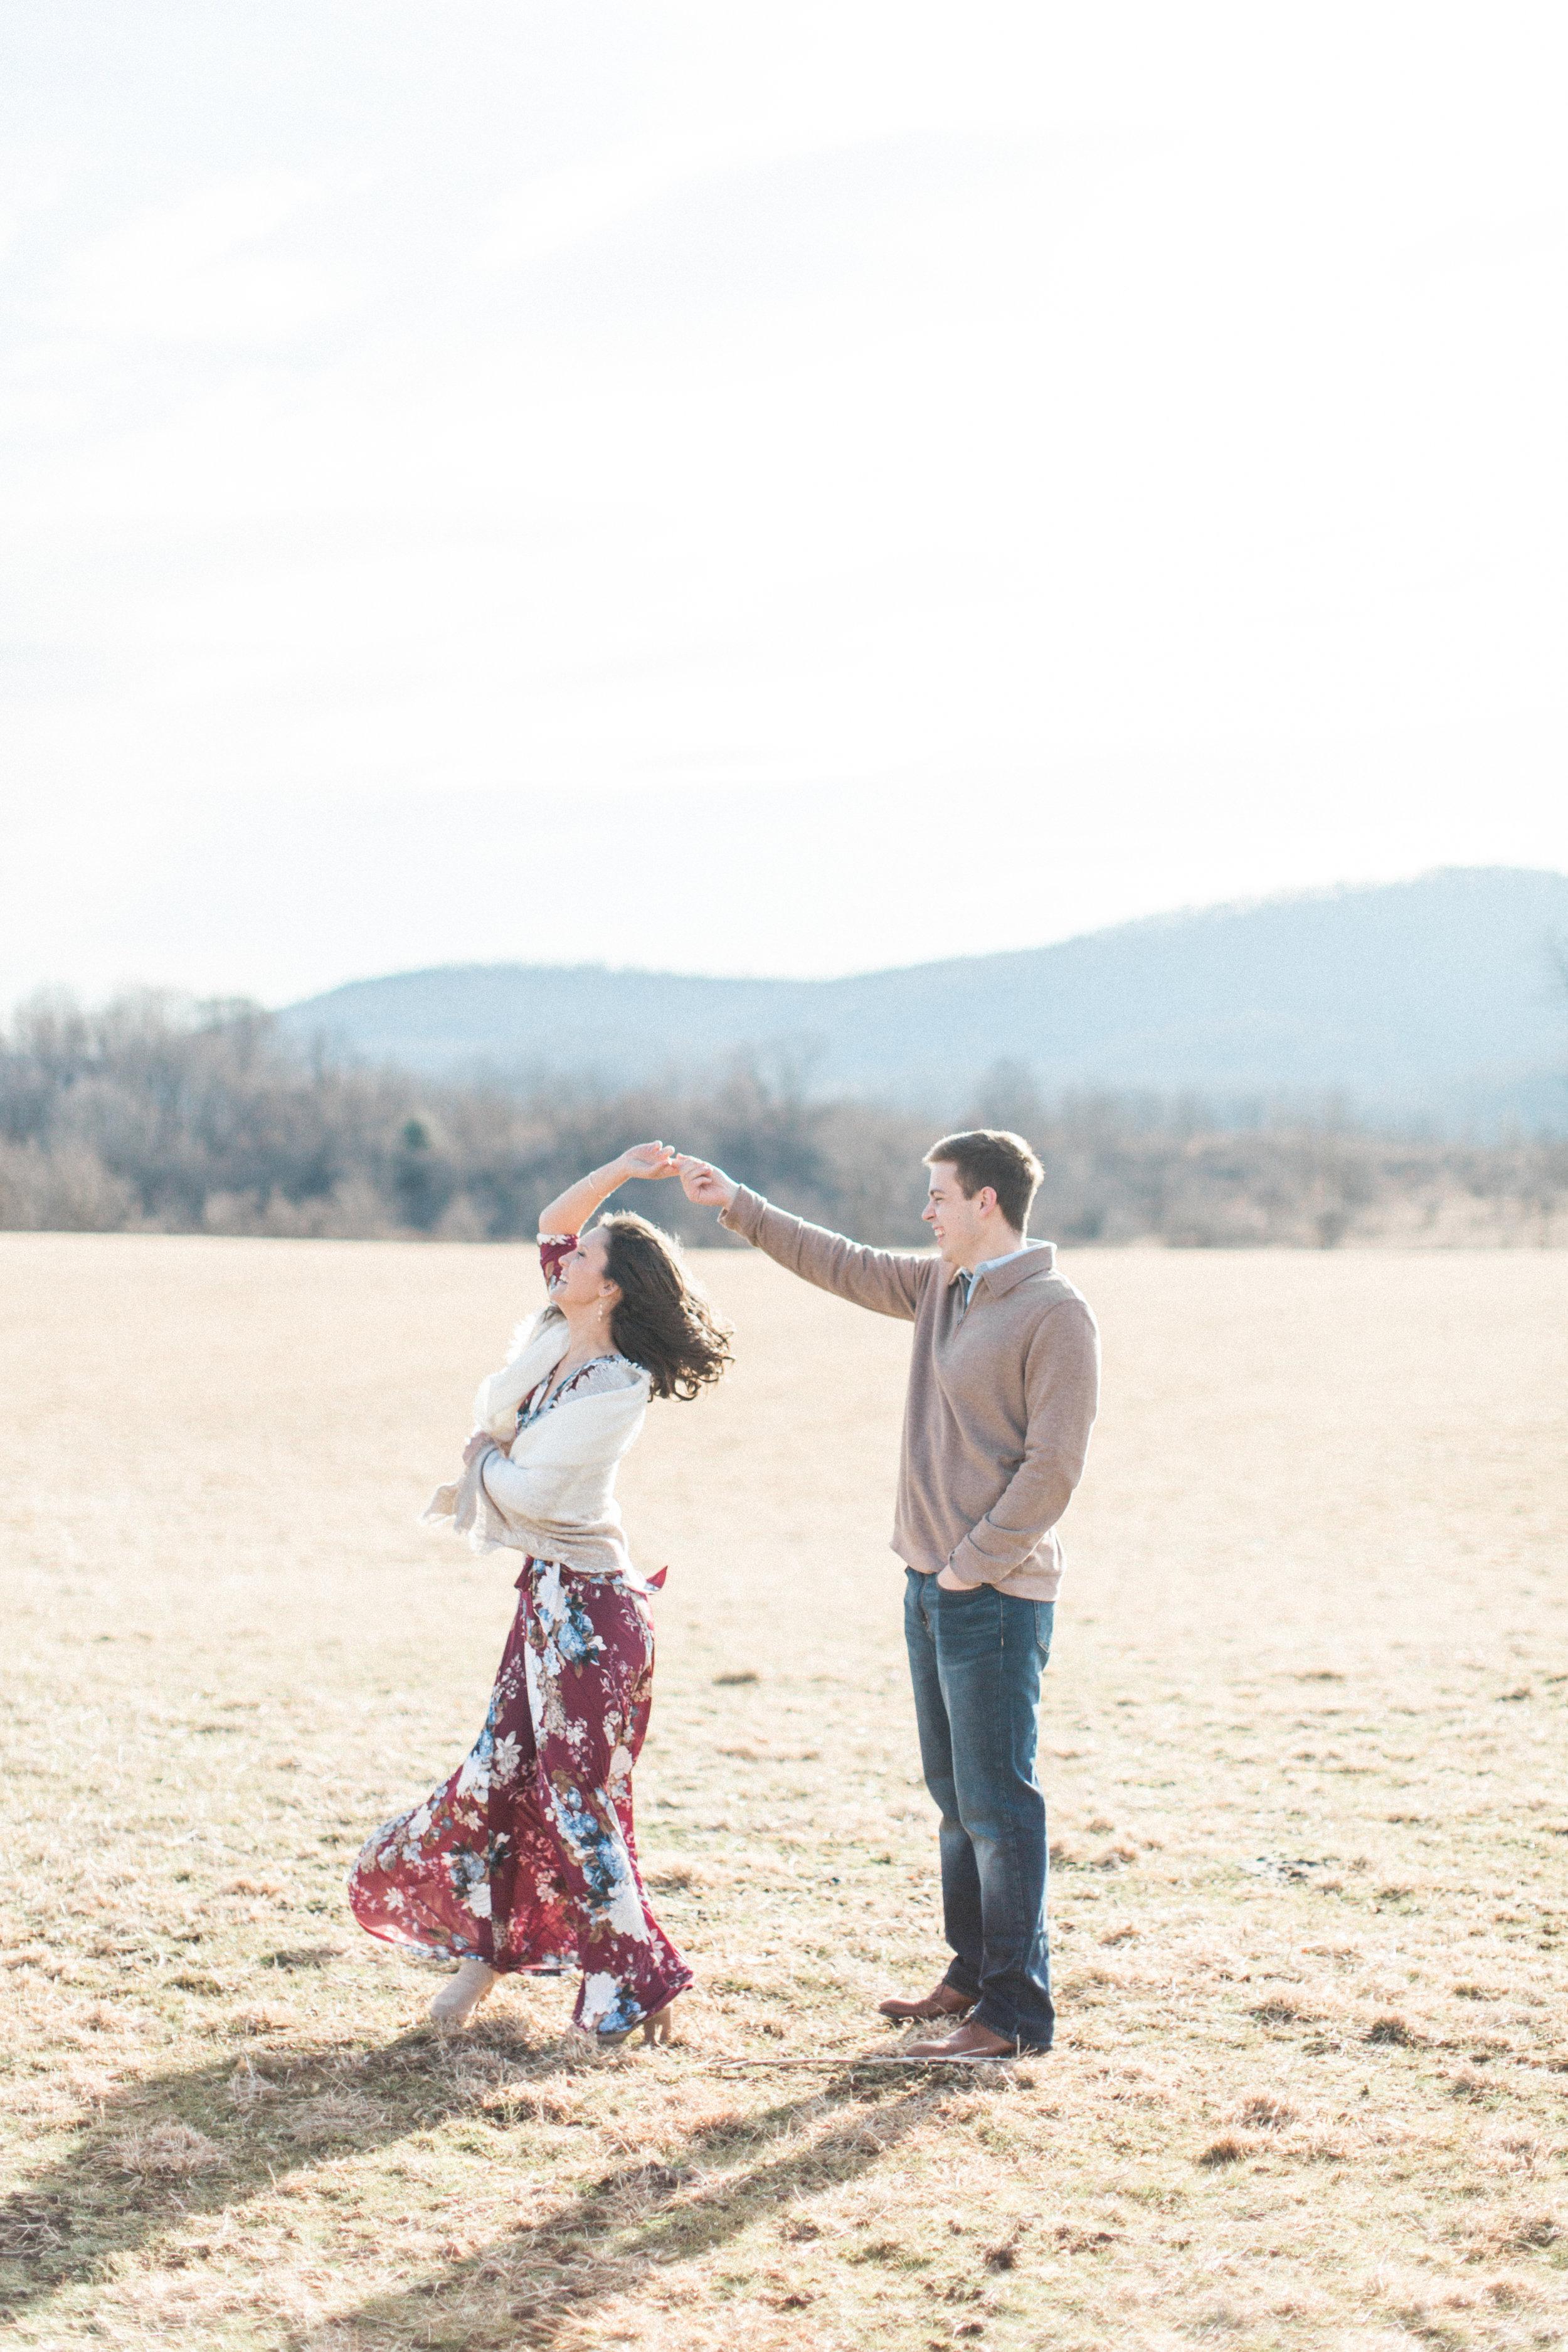 Abigail_Jill_Photography_Maryland_Engagement_Farm_Emily_Justin243.jpg